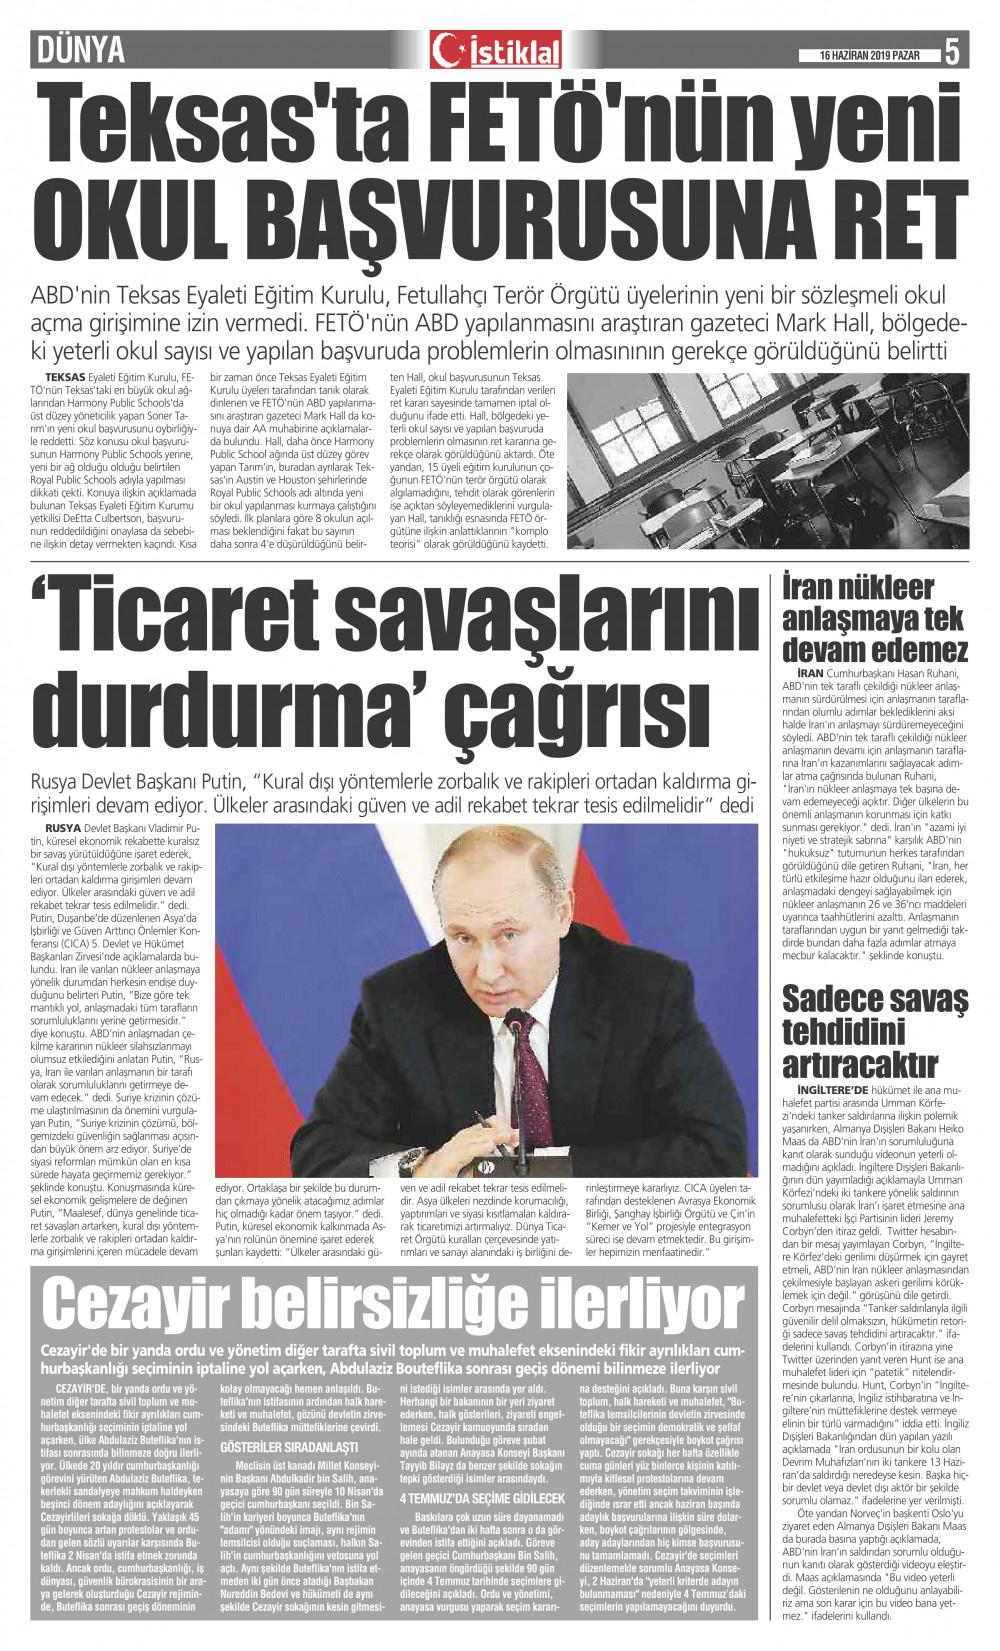 İstiklal Gazetesi 5'nci Sayfa